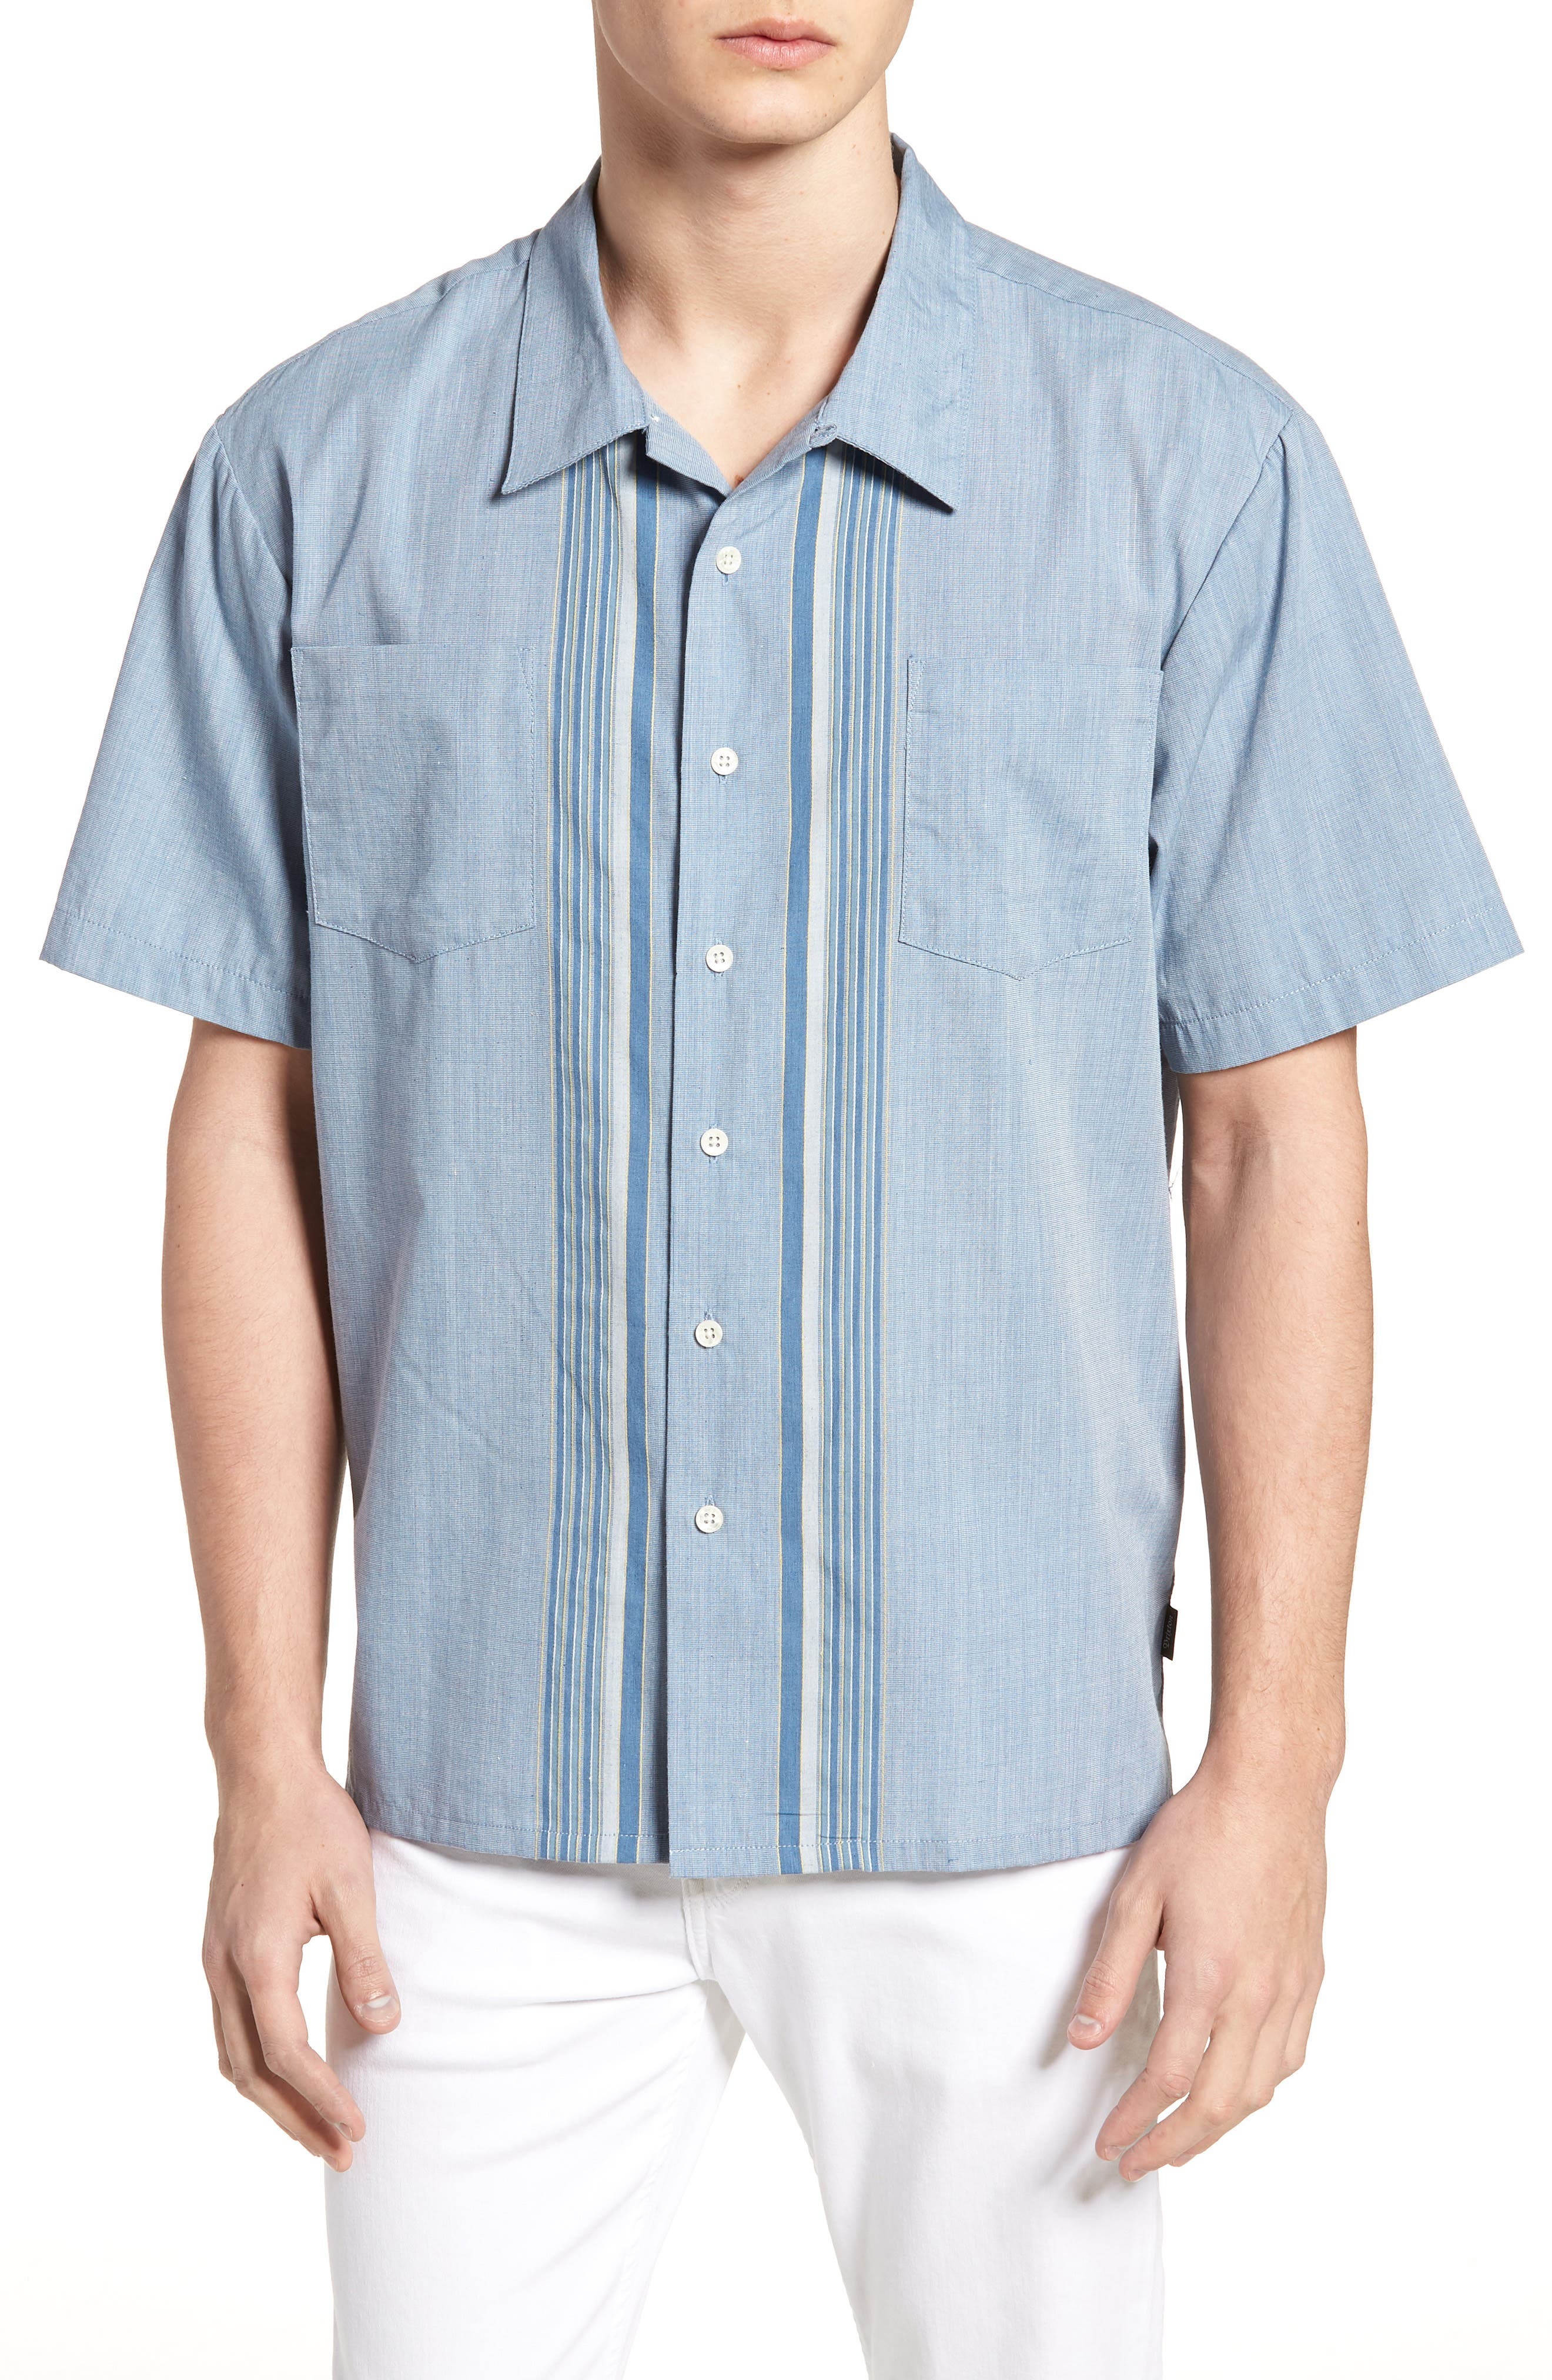 Cruze Woven Shirt,                             Main thumbnail 1, color,                             400